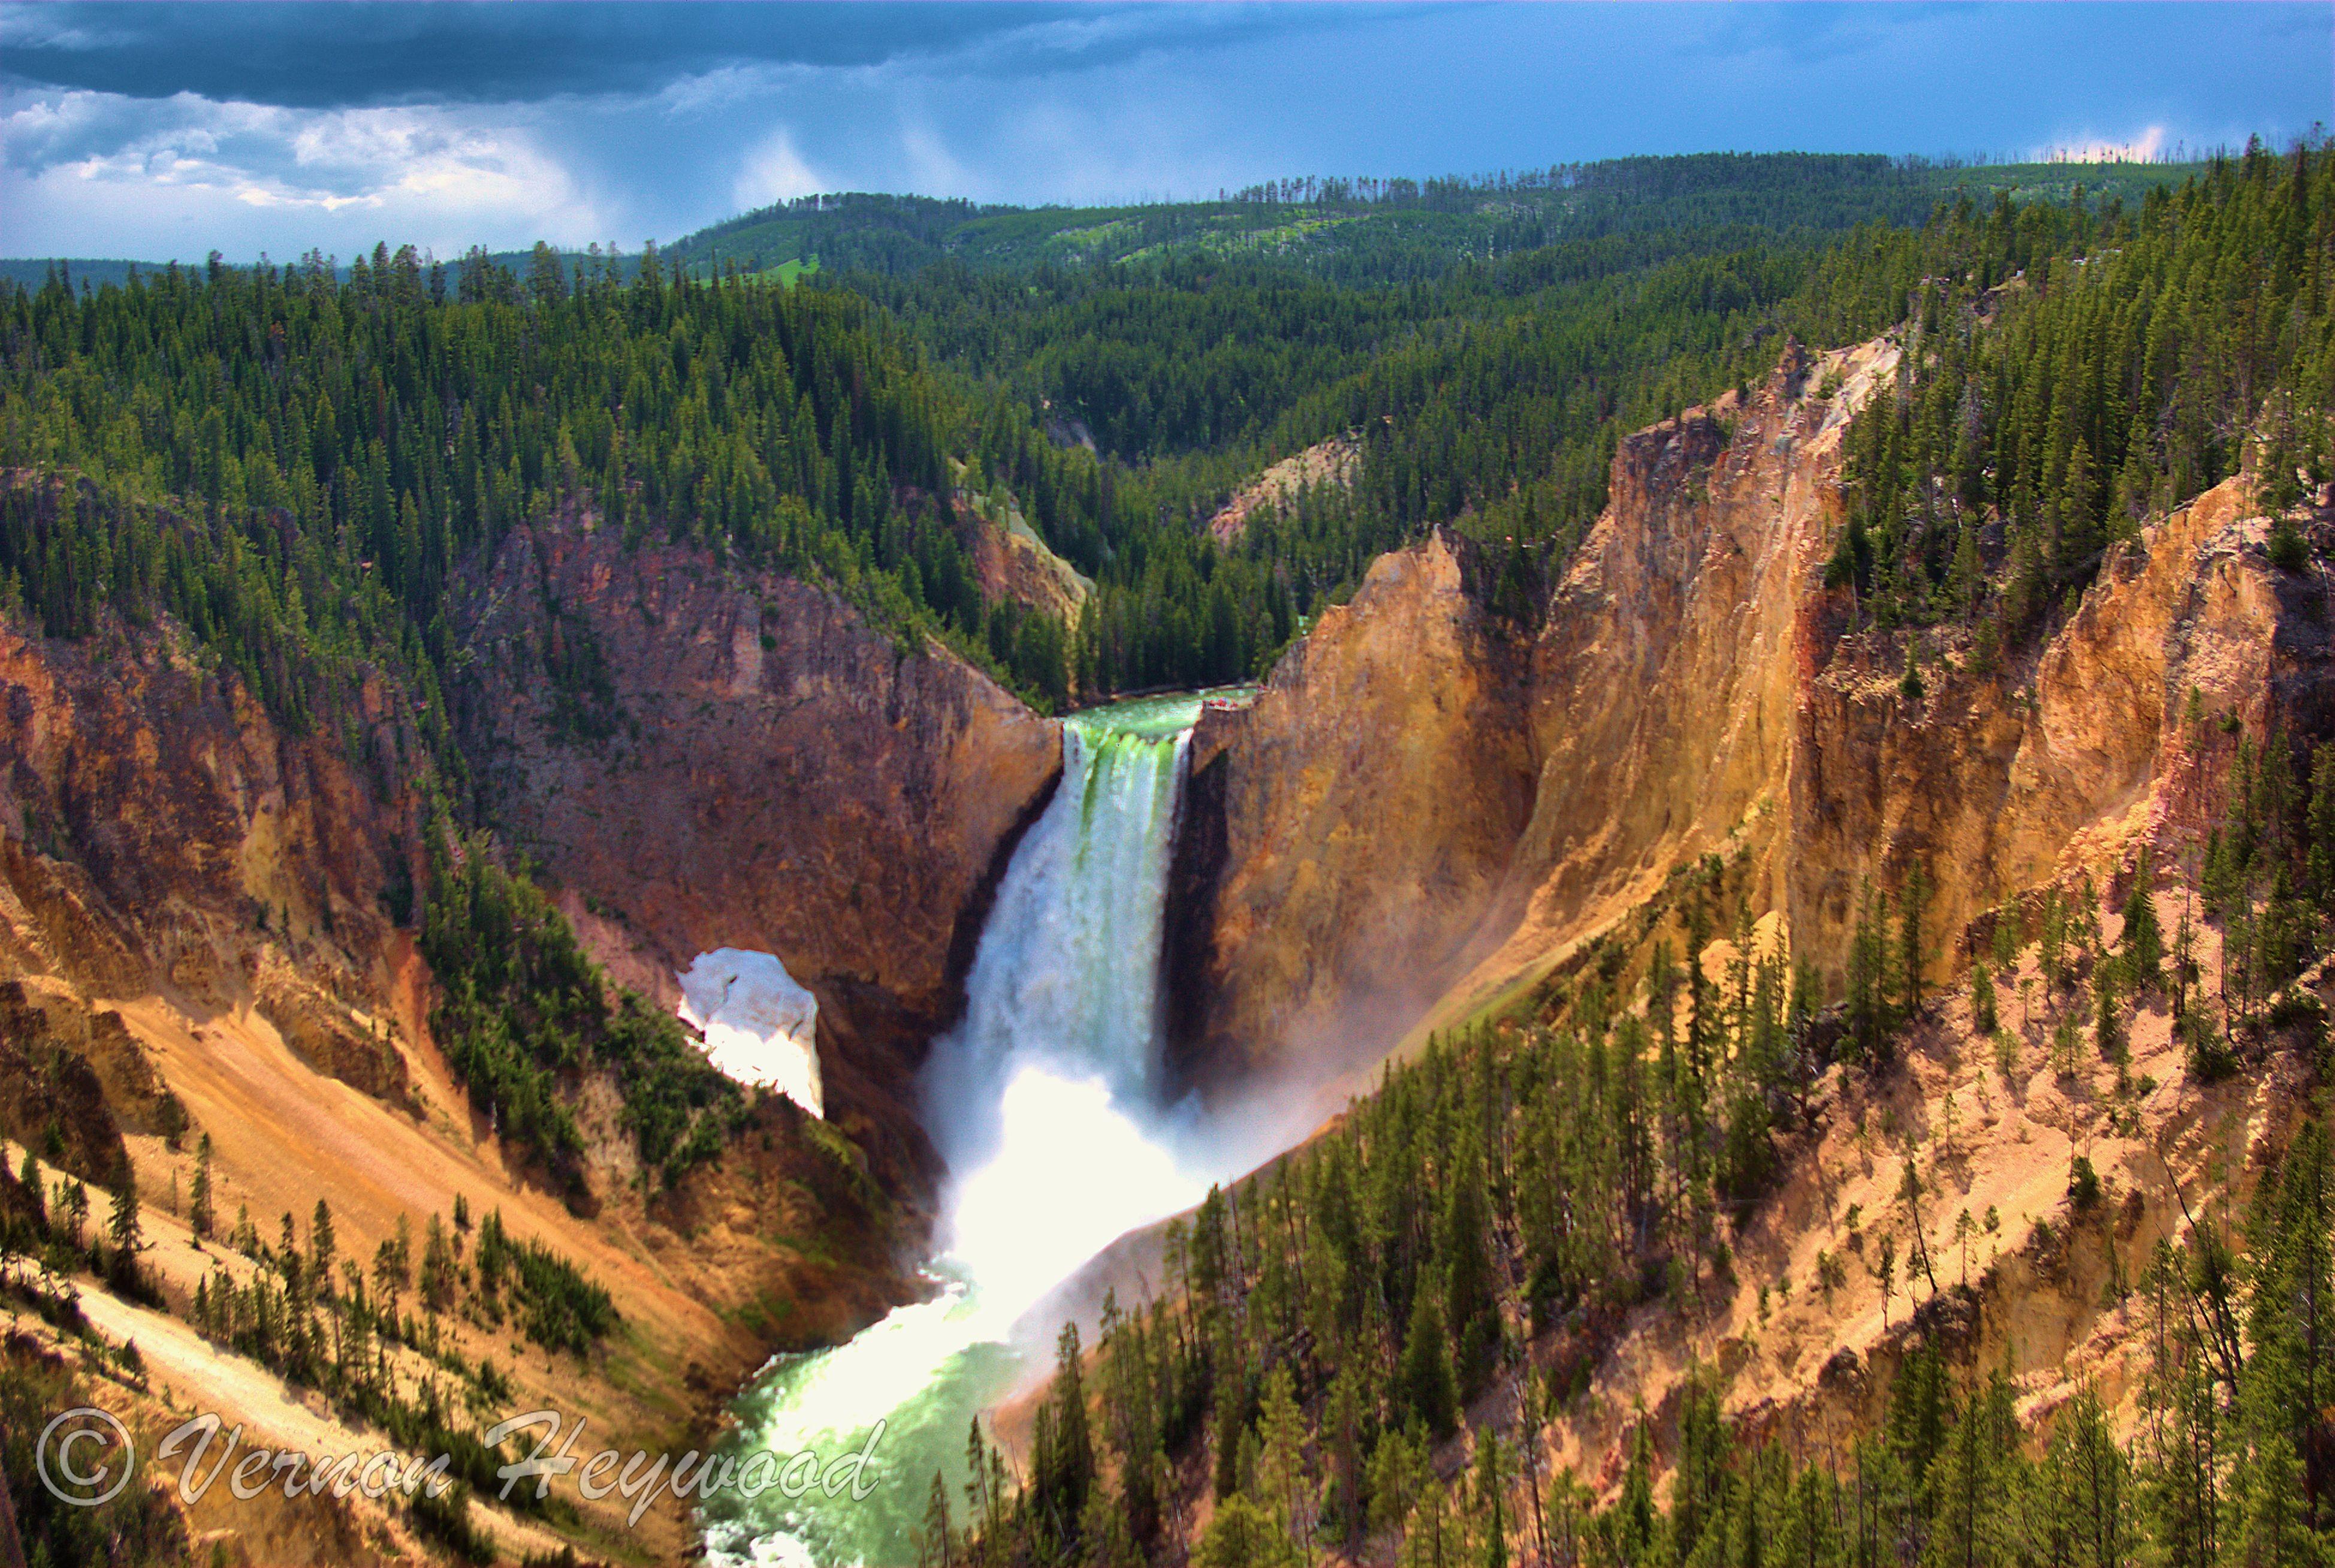 Havasu Falls Wallpaper Yellowstone Photography July 3 2014 Vernonheywood Com